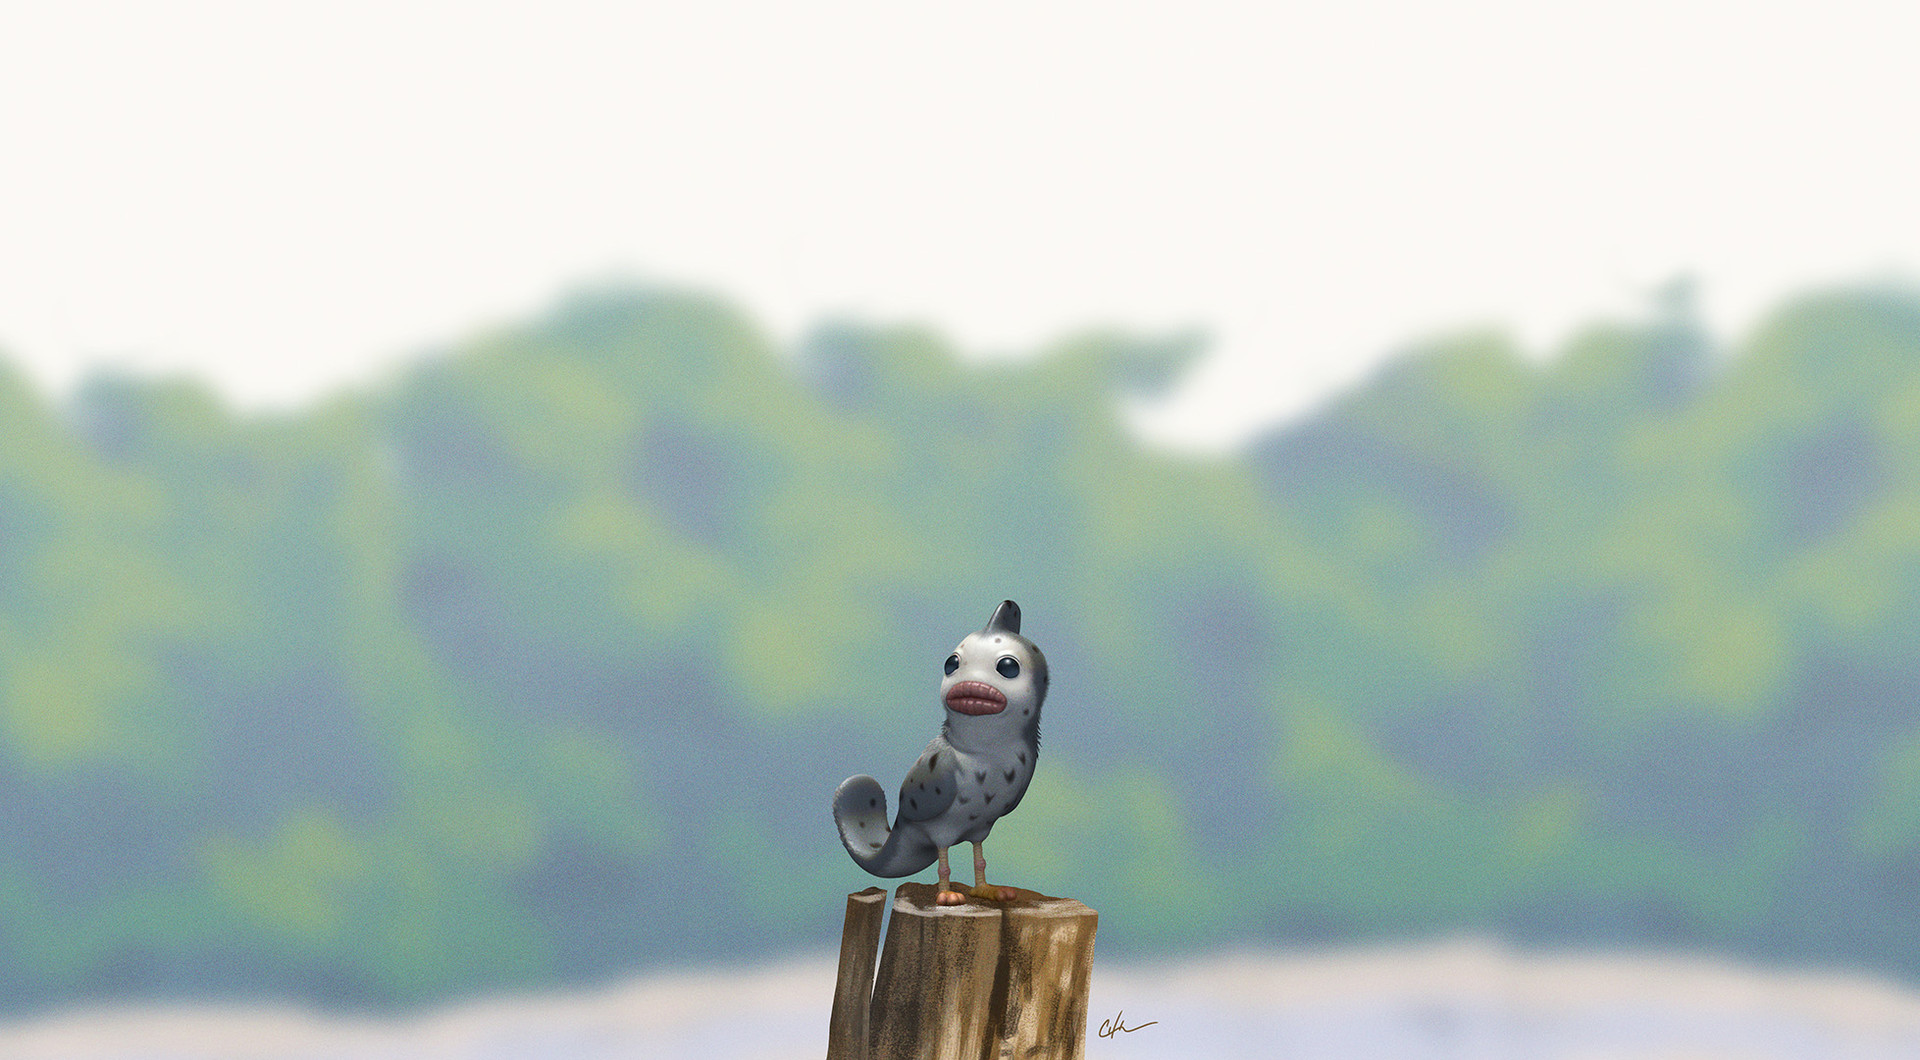 bobby-chiu-aqua-bird-small.jpg